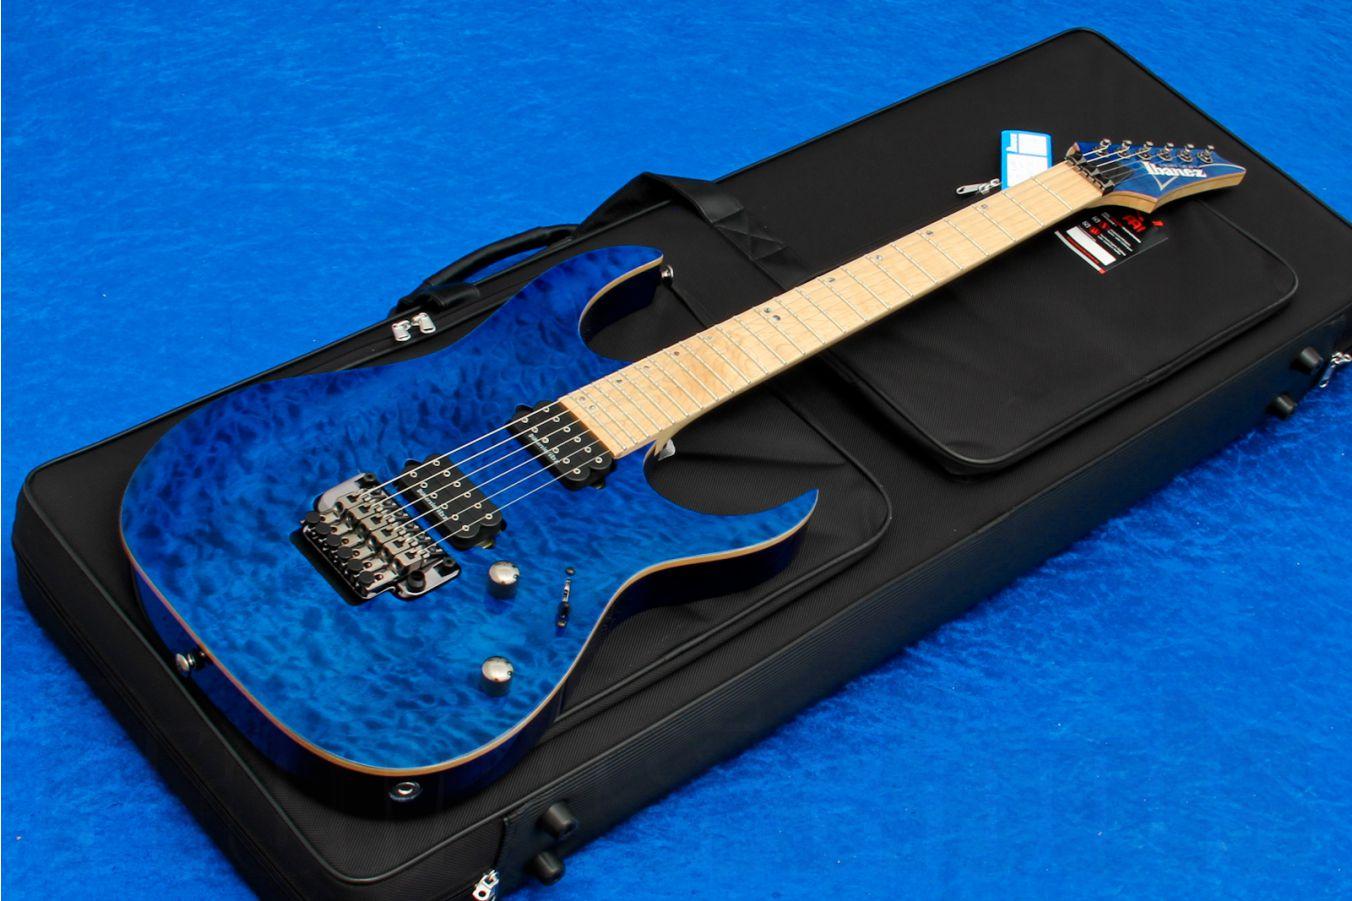 Ibanez RG920MQMZ CBE Premium - Cobalt Blue Surge - Limited Edition